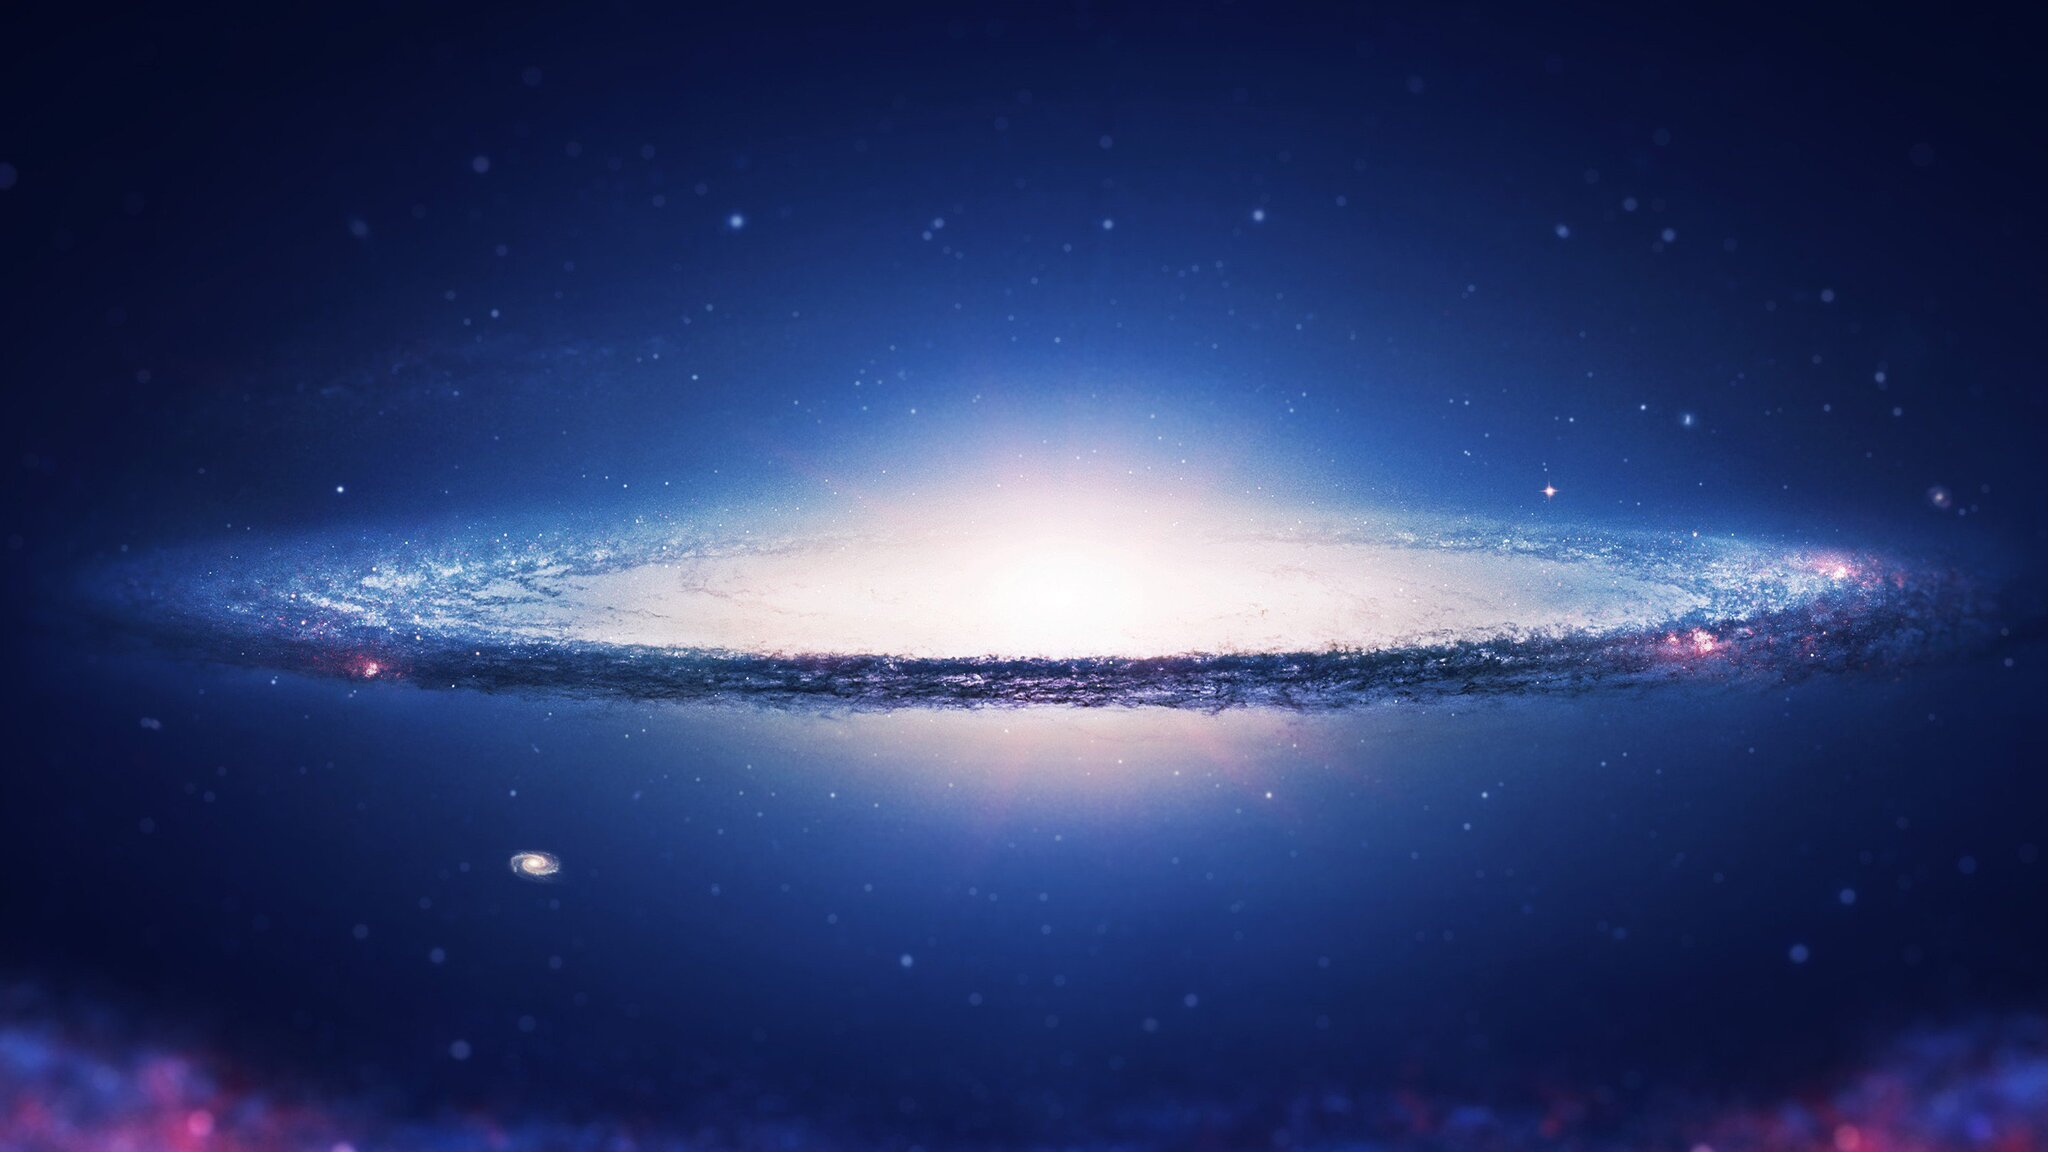 2048x1152 spiral galaxy 2048x1152 resolution hd 4k for 2048x1152 wallpaper